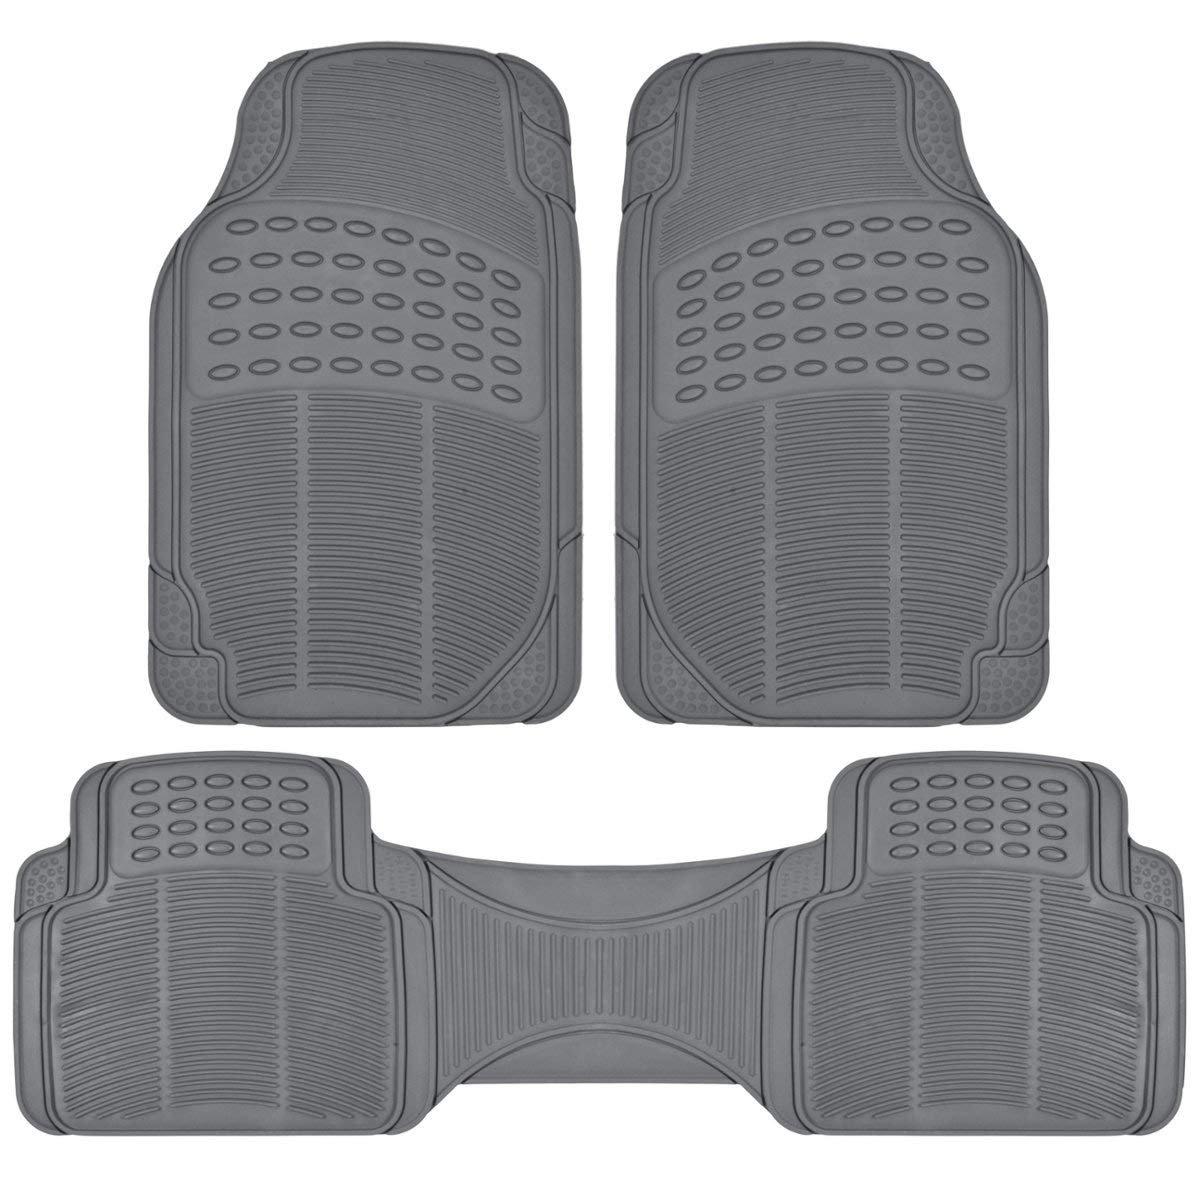 Heavy Duty Car Floor Mats - Universal for Car Truck SUV - Full 3pc Set in Gray